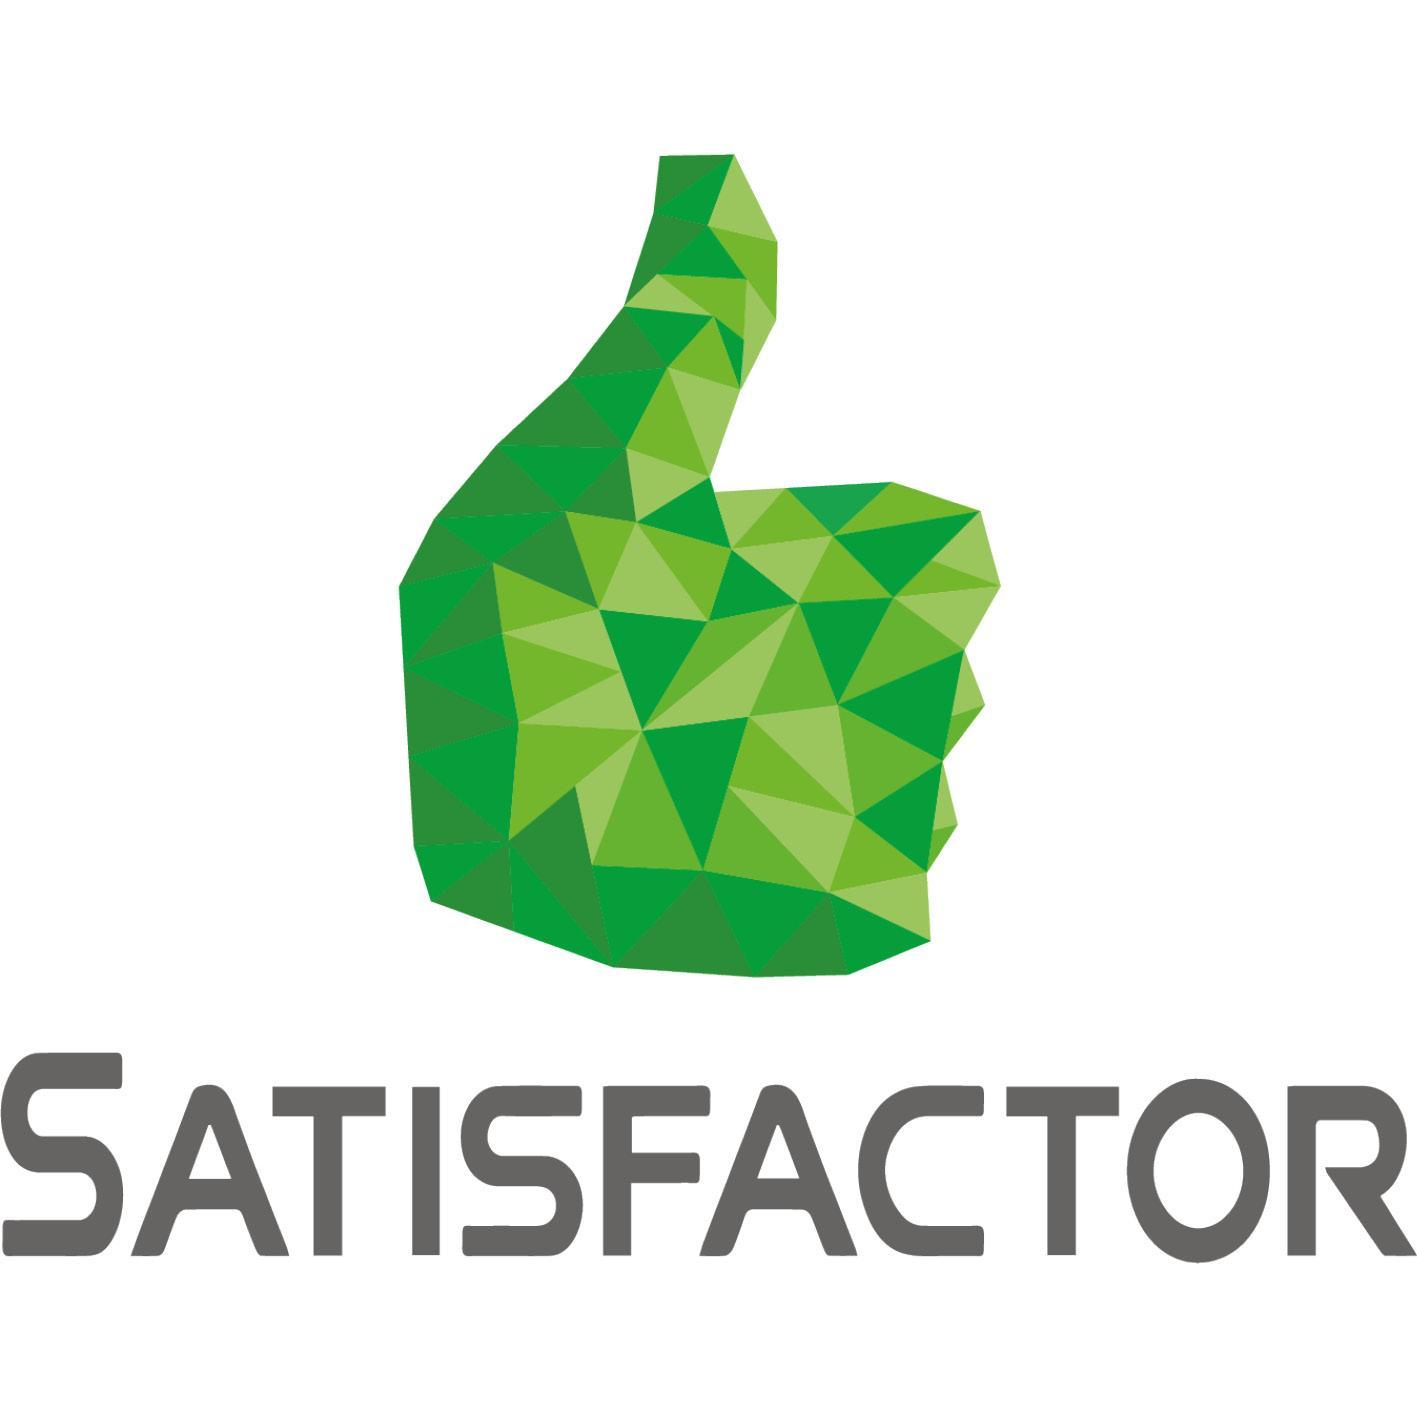 SATISFACTOR Sarl logo